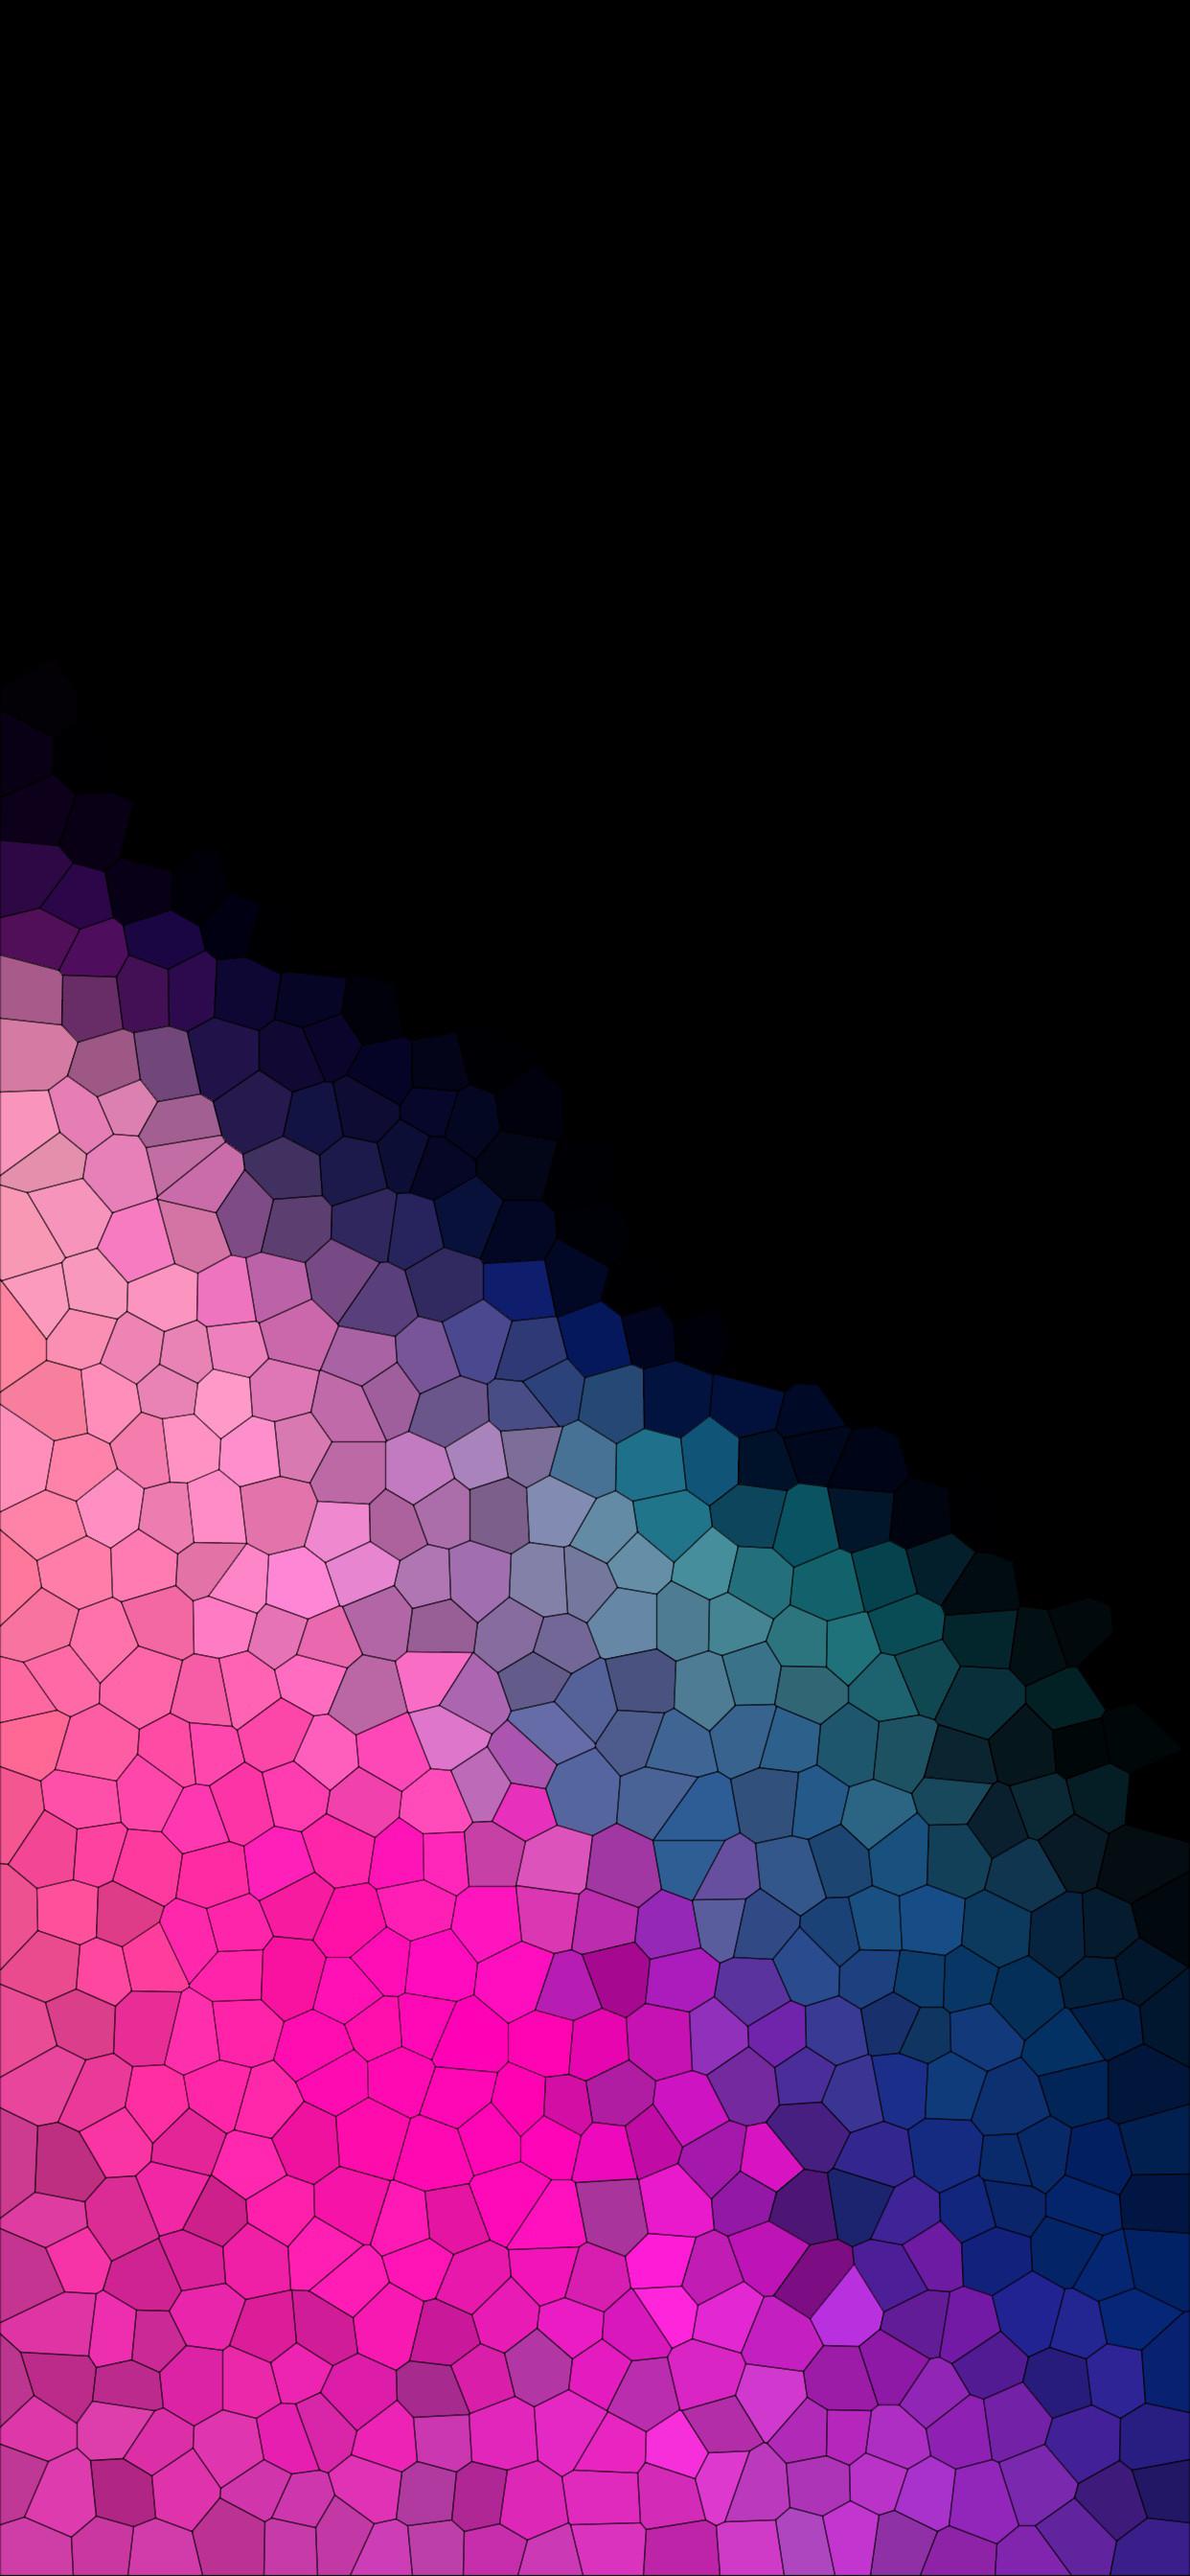 Mosaic For Iphonexsmax Iphonexr True Black Gradient Hd Wallpaper Iphone Xsmax 1242x2688 Download Hd Wallpaper Wallpapertip